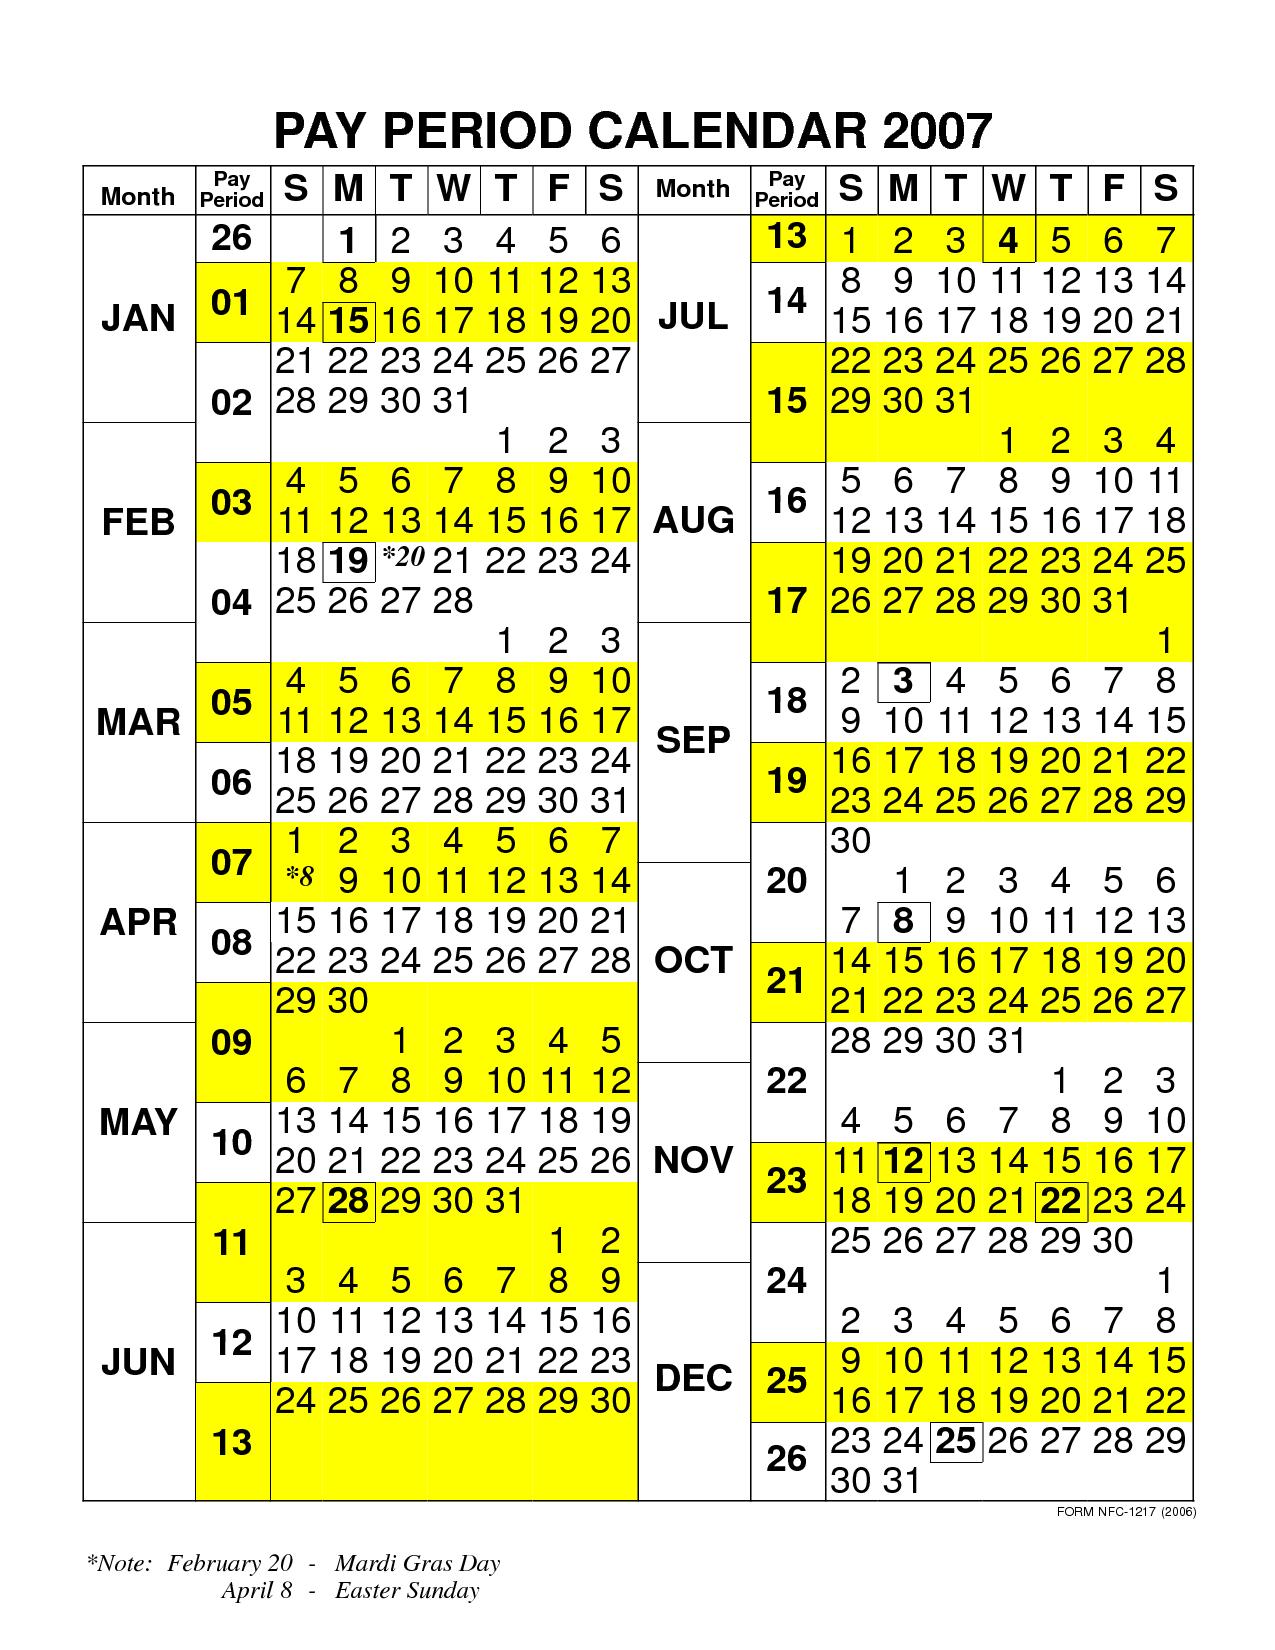 Federal Pay Period Chart - Caska In 2015 Pay Period Calendar Federal